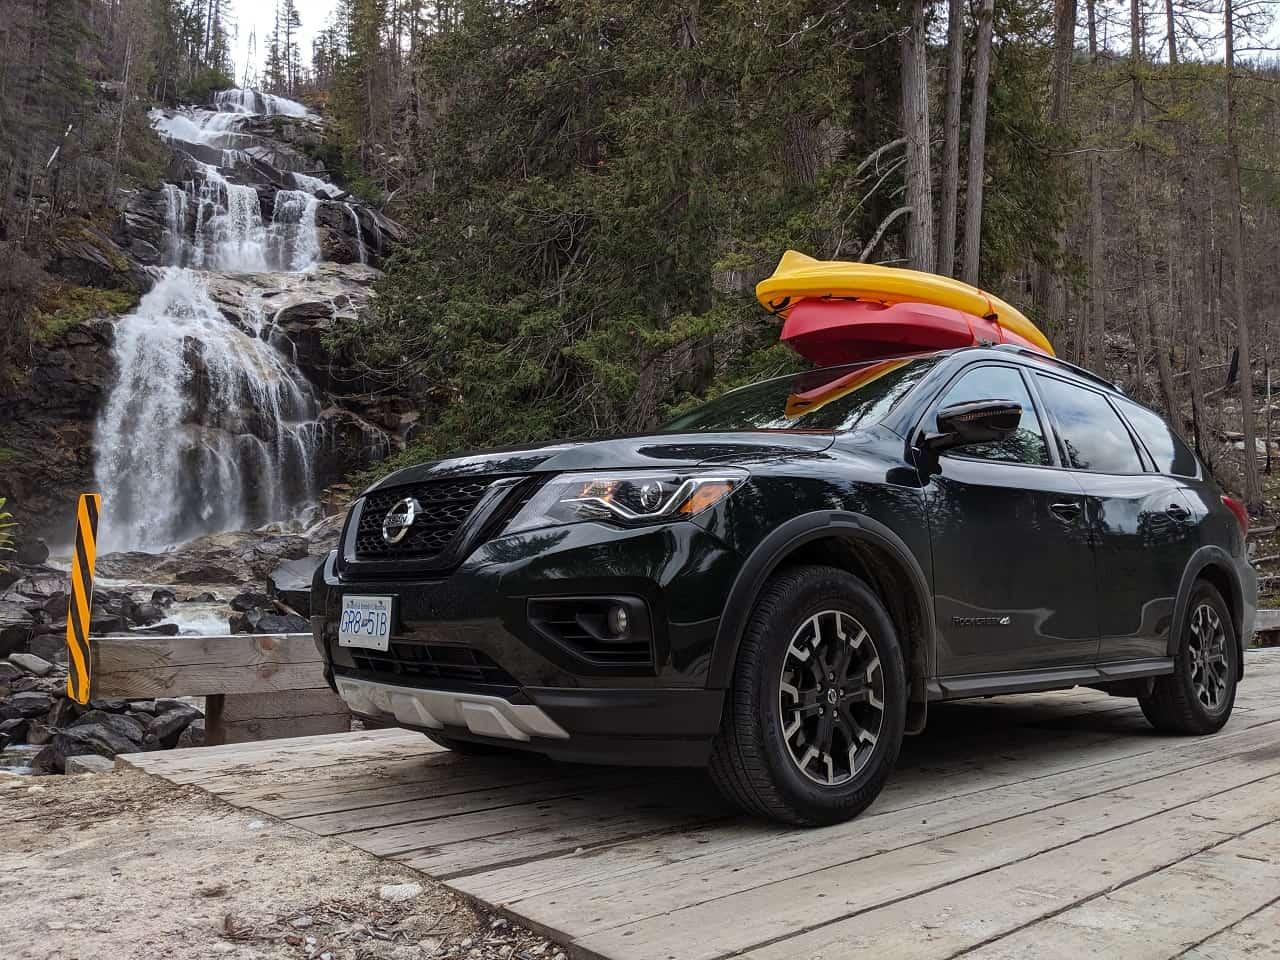 2020 Nissan Pathfinder Rock Creek Edition Review ...